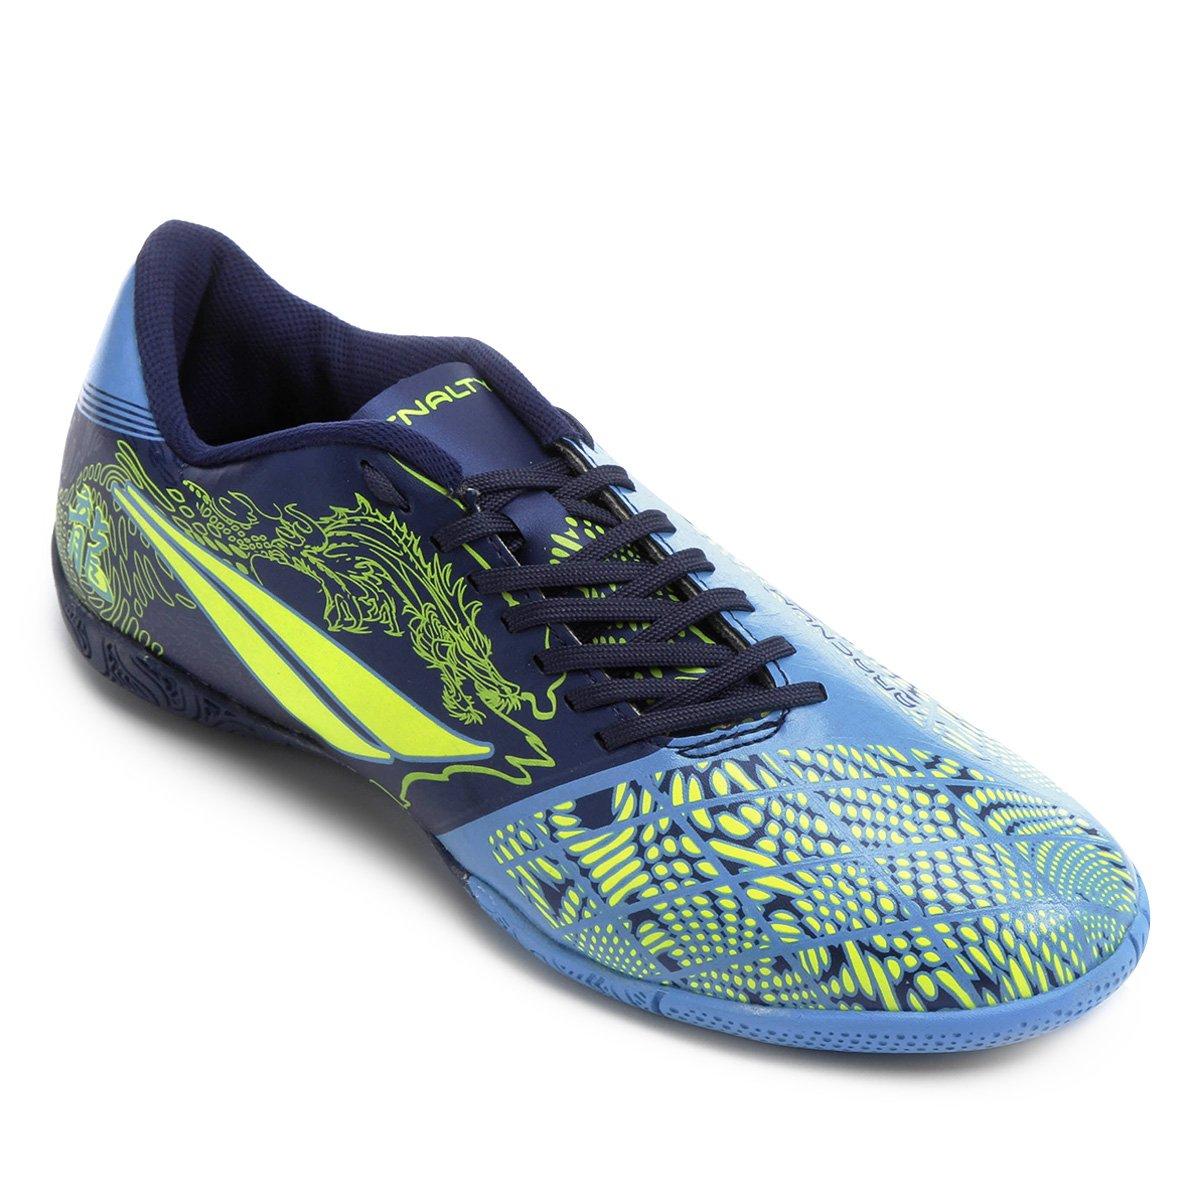 a5ff44ead19ef Chuteira Futsal Penalty Victoria Dragon 7 Masculina - Azul e Marinho |  Netshoes